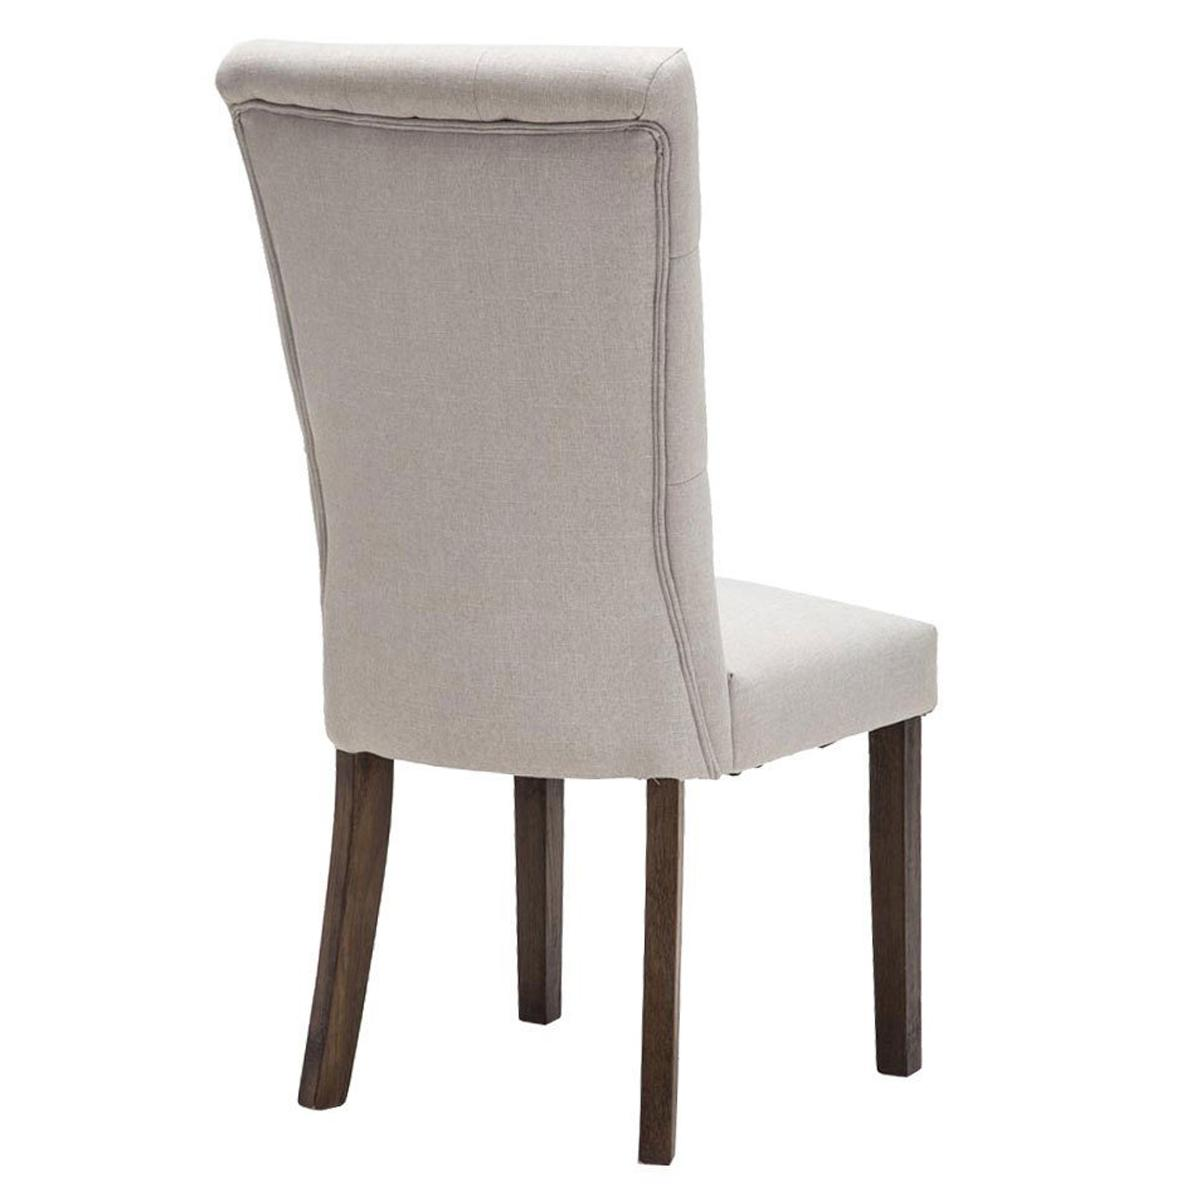 Silla de comedor selena tapizada en tela color crema - Tela para sillas de comedor ...